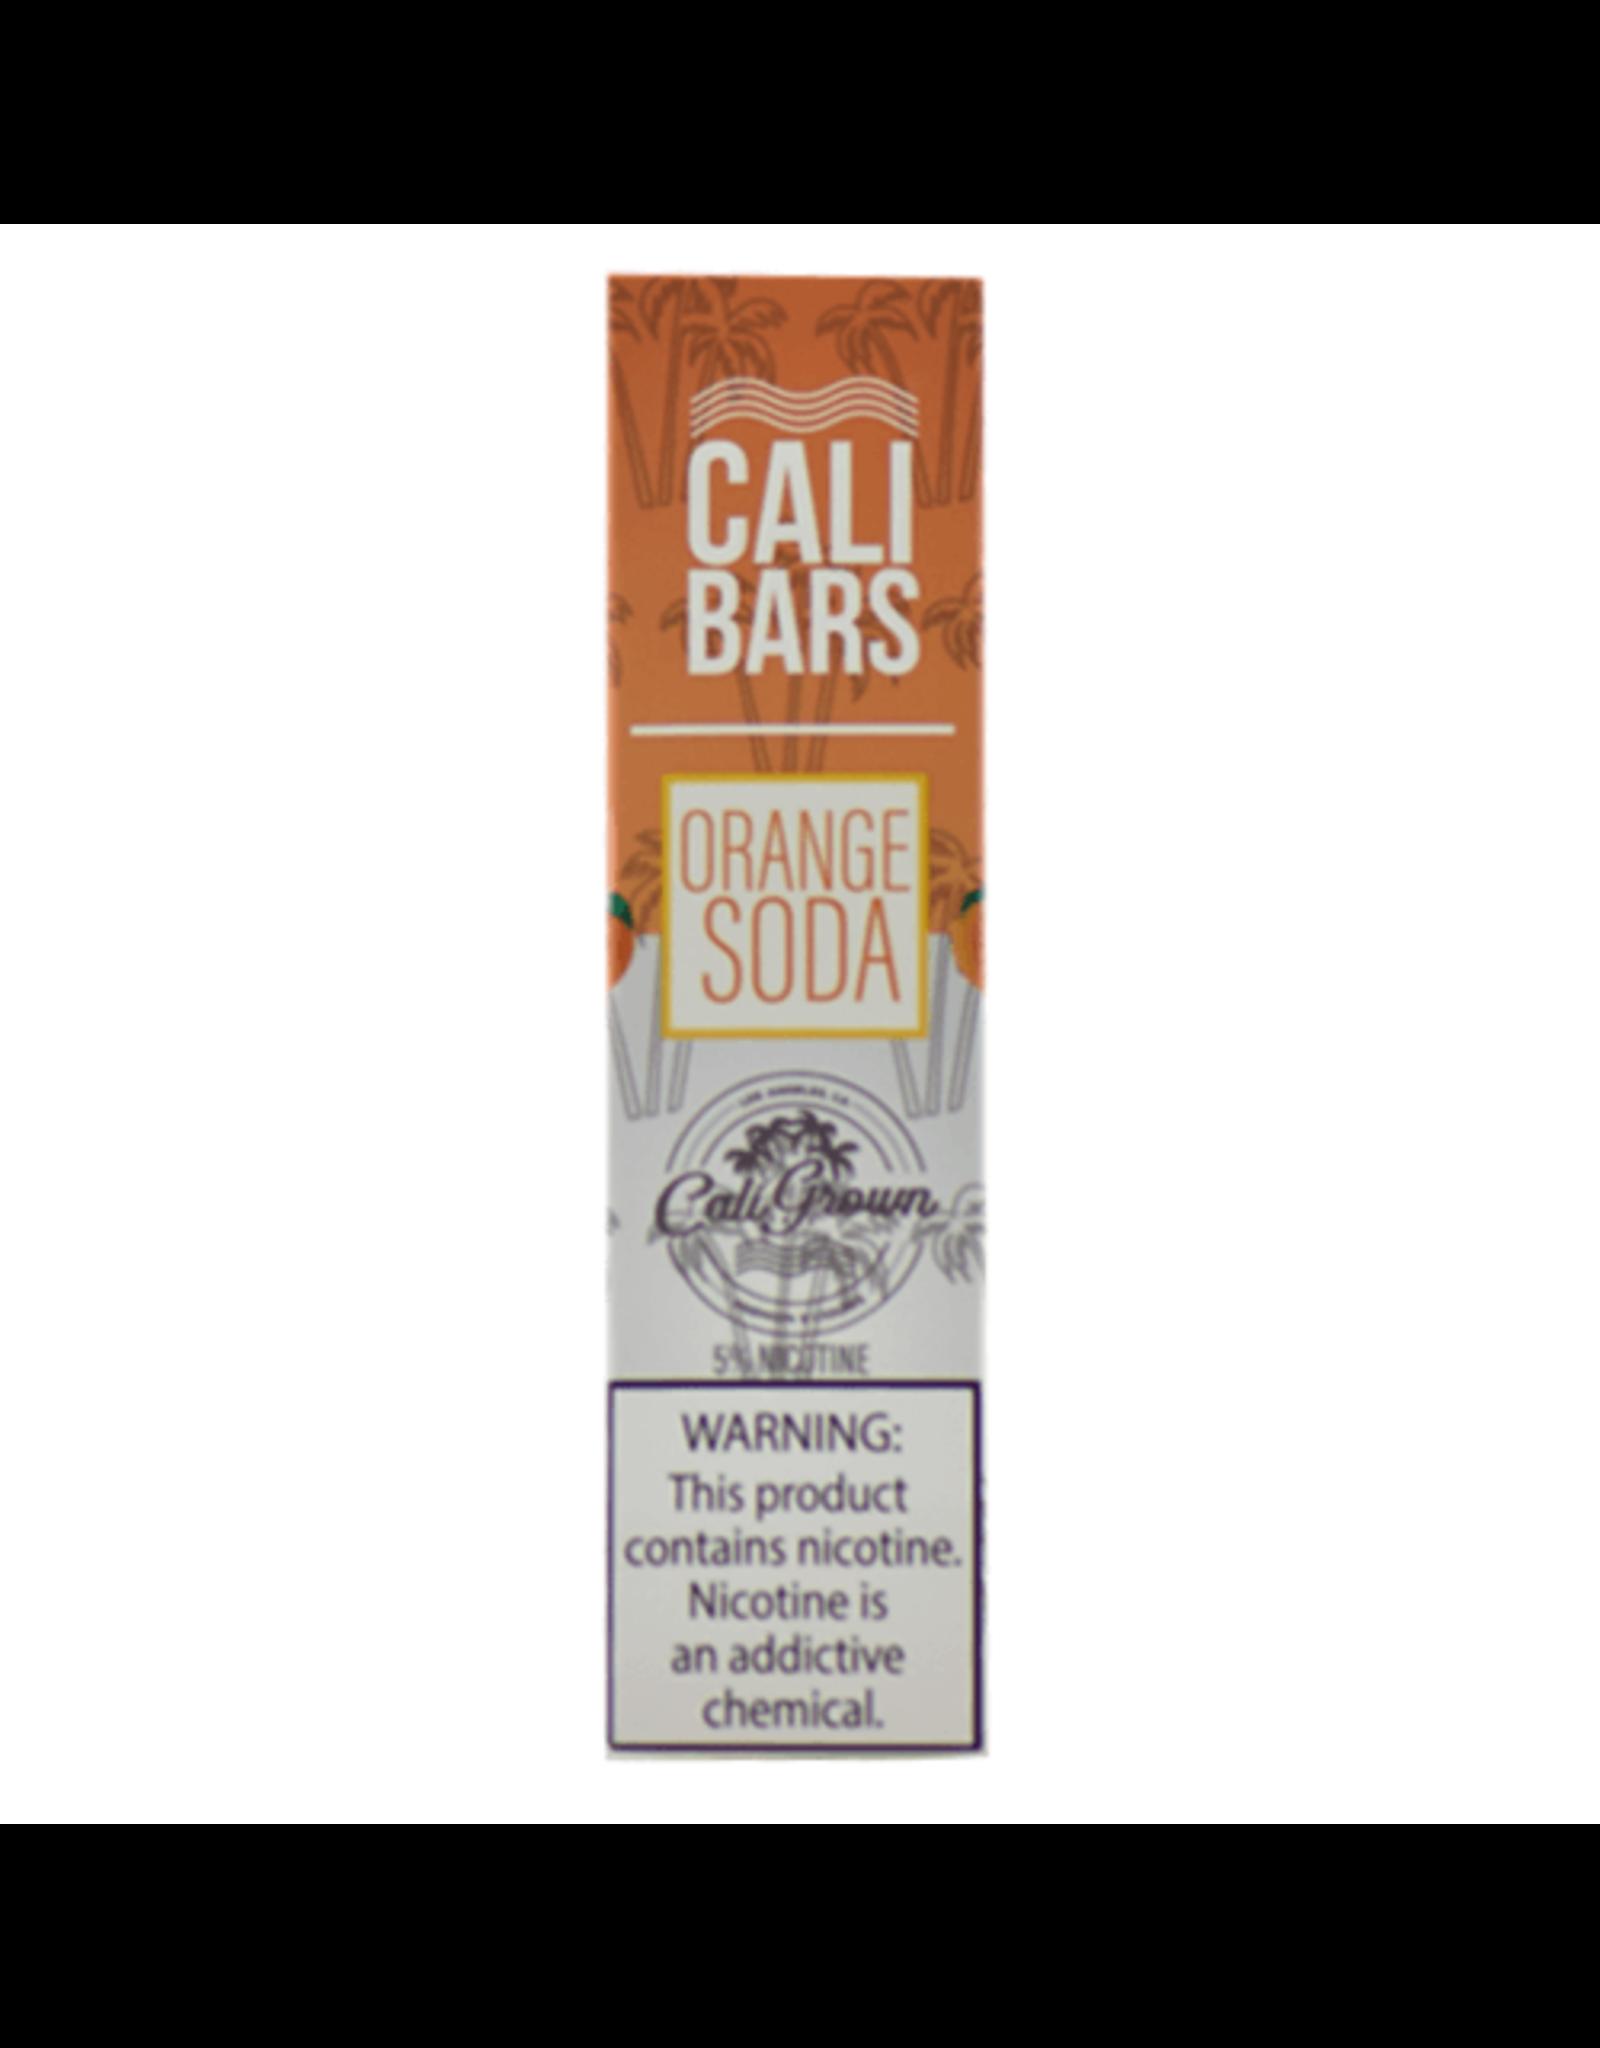 Cali Bars Cali Bars Orange Soda 5%